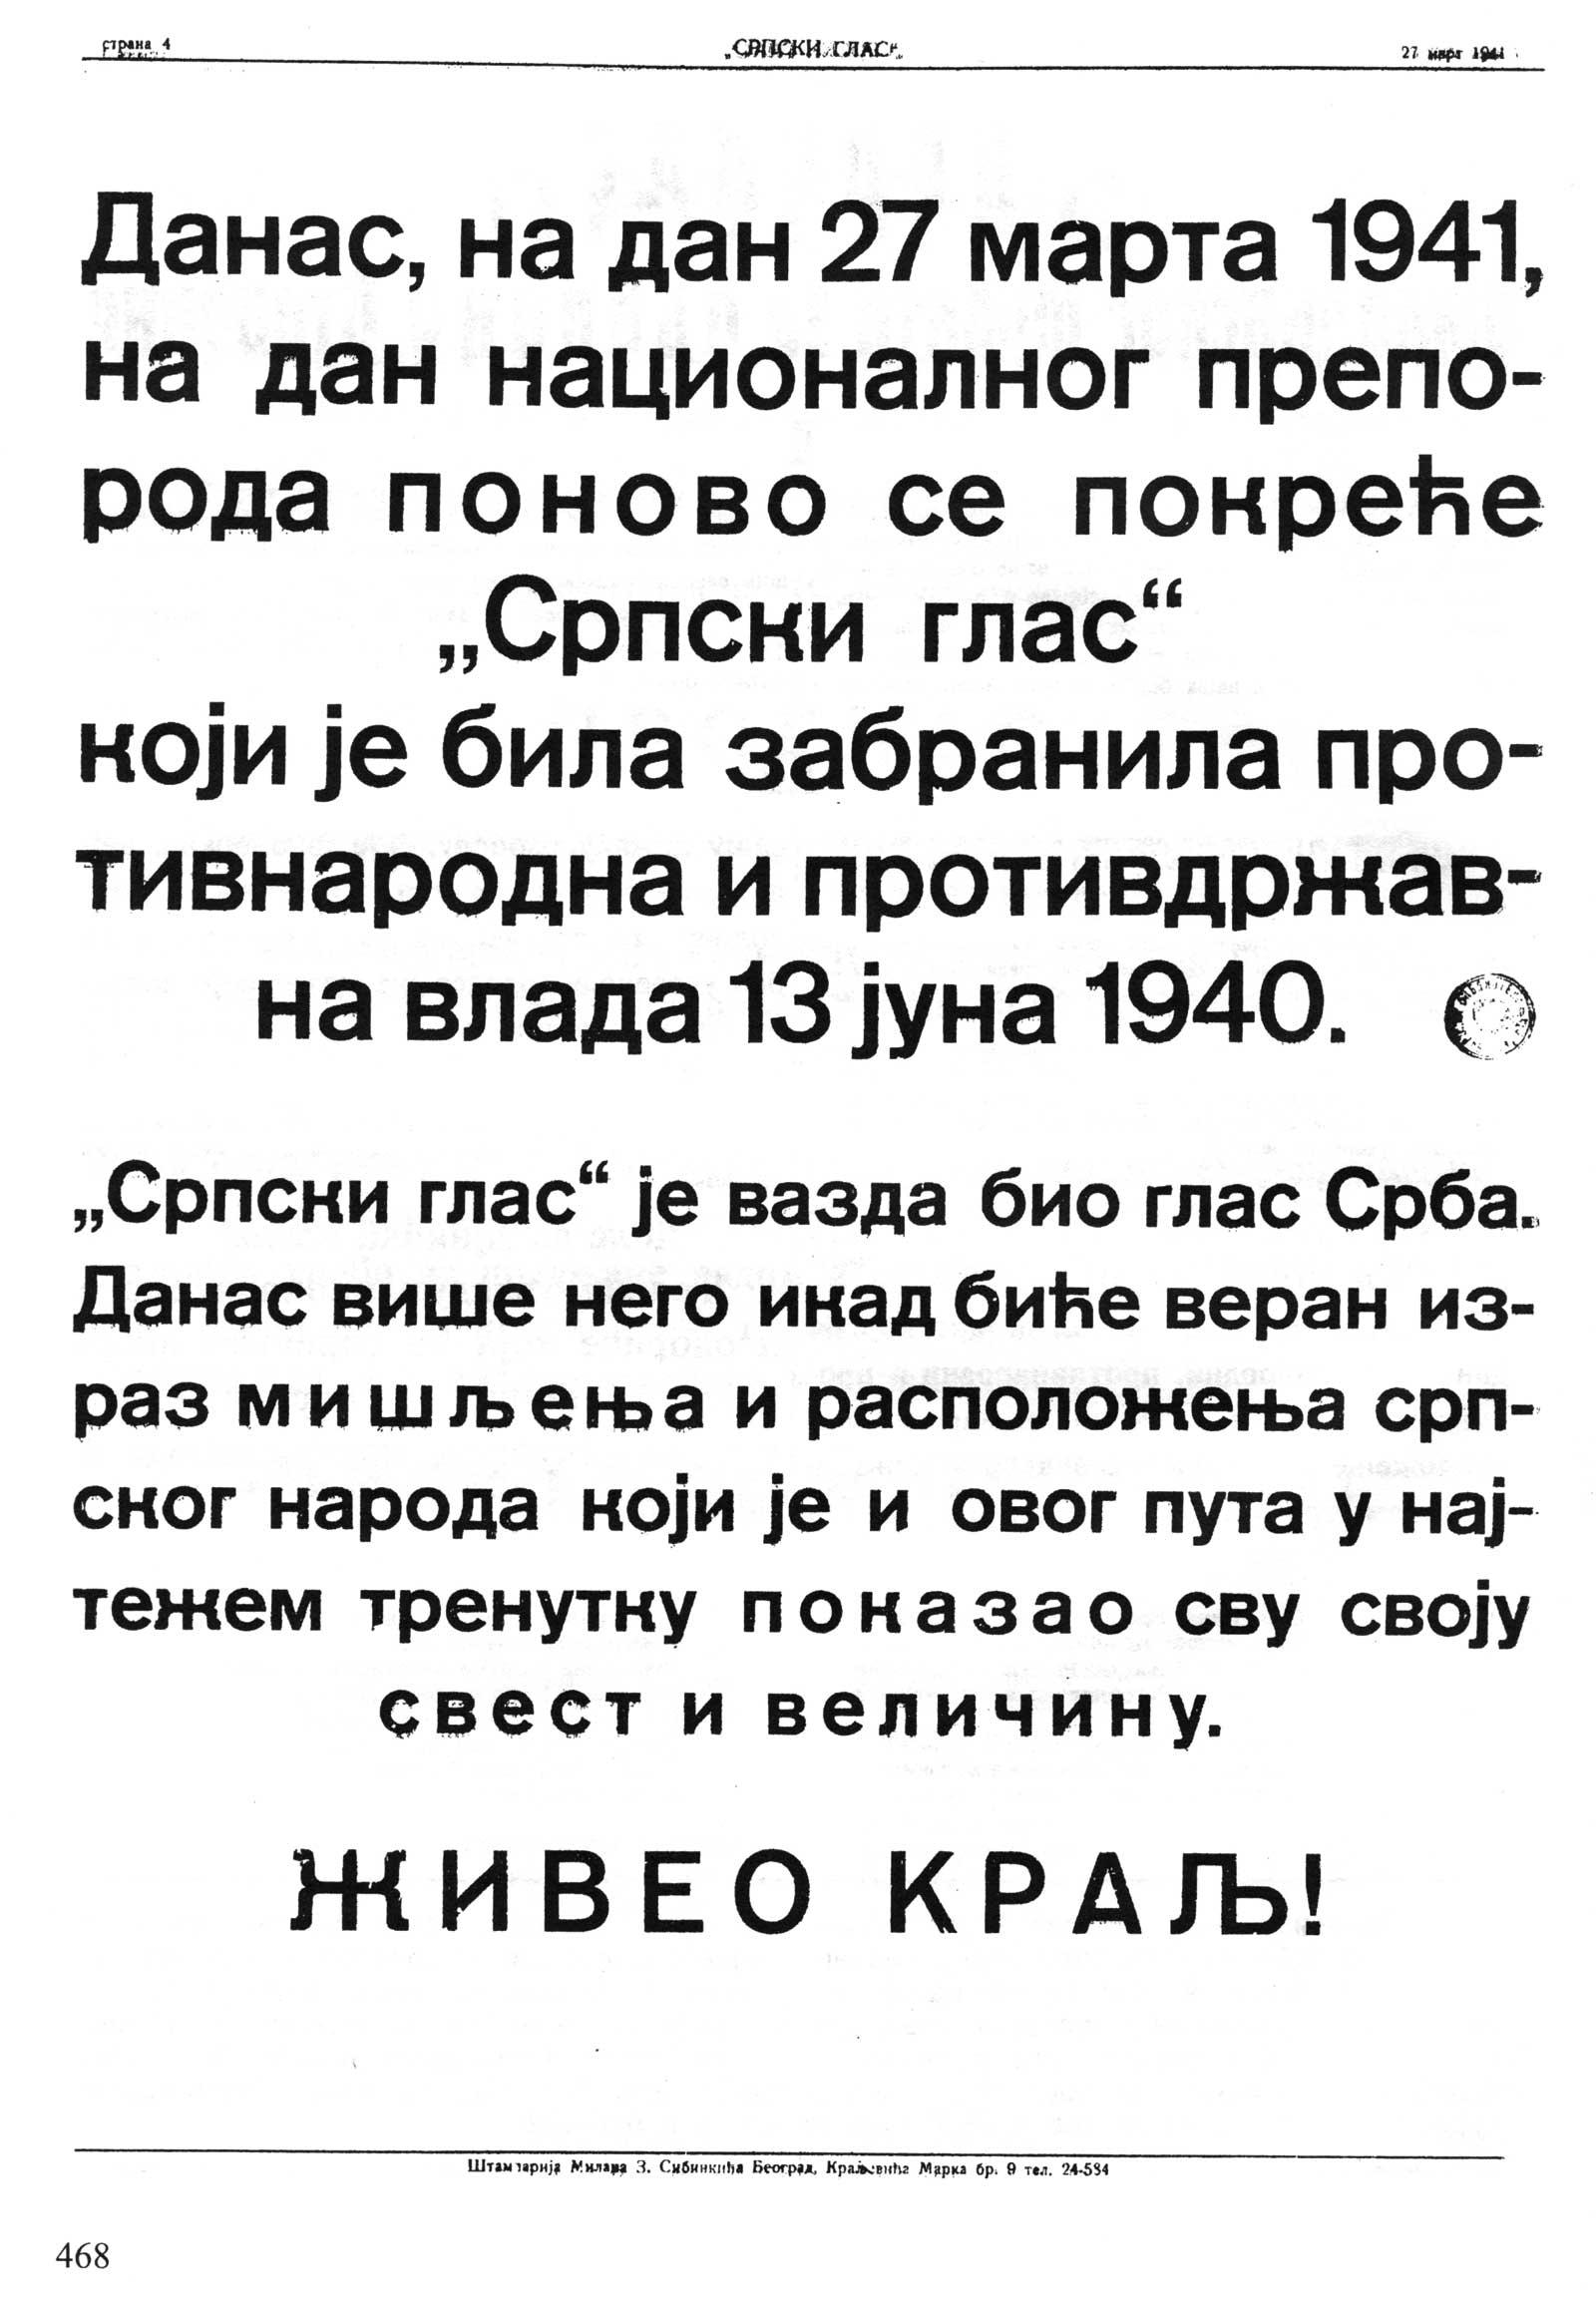 [Слика: Save0389.jpg]